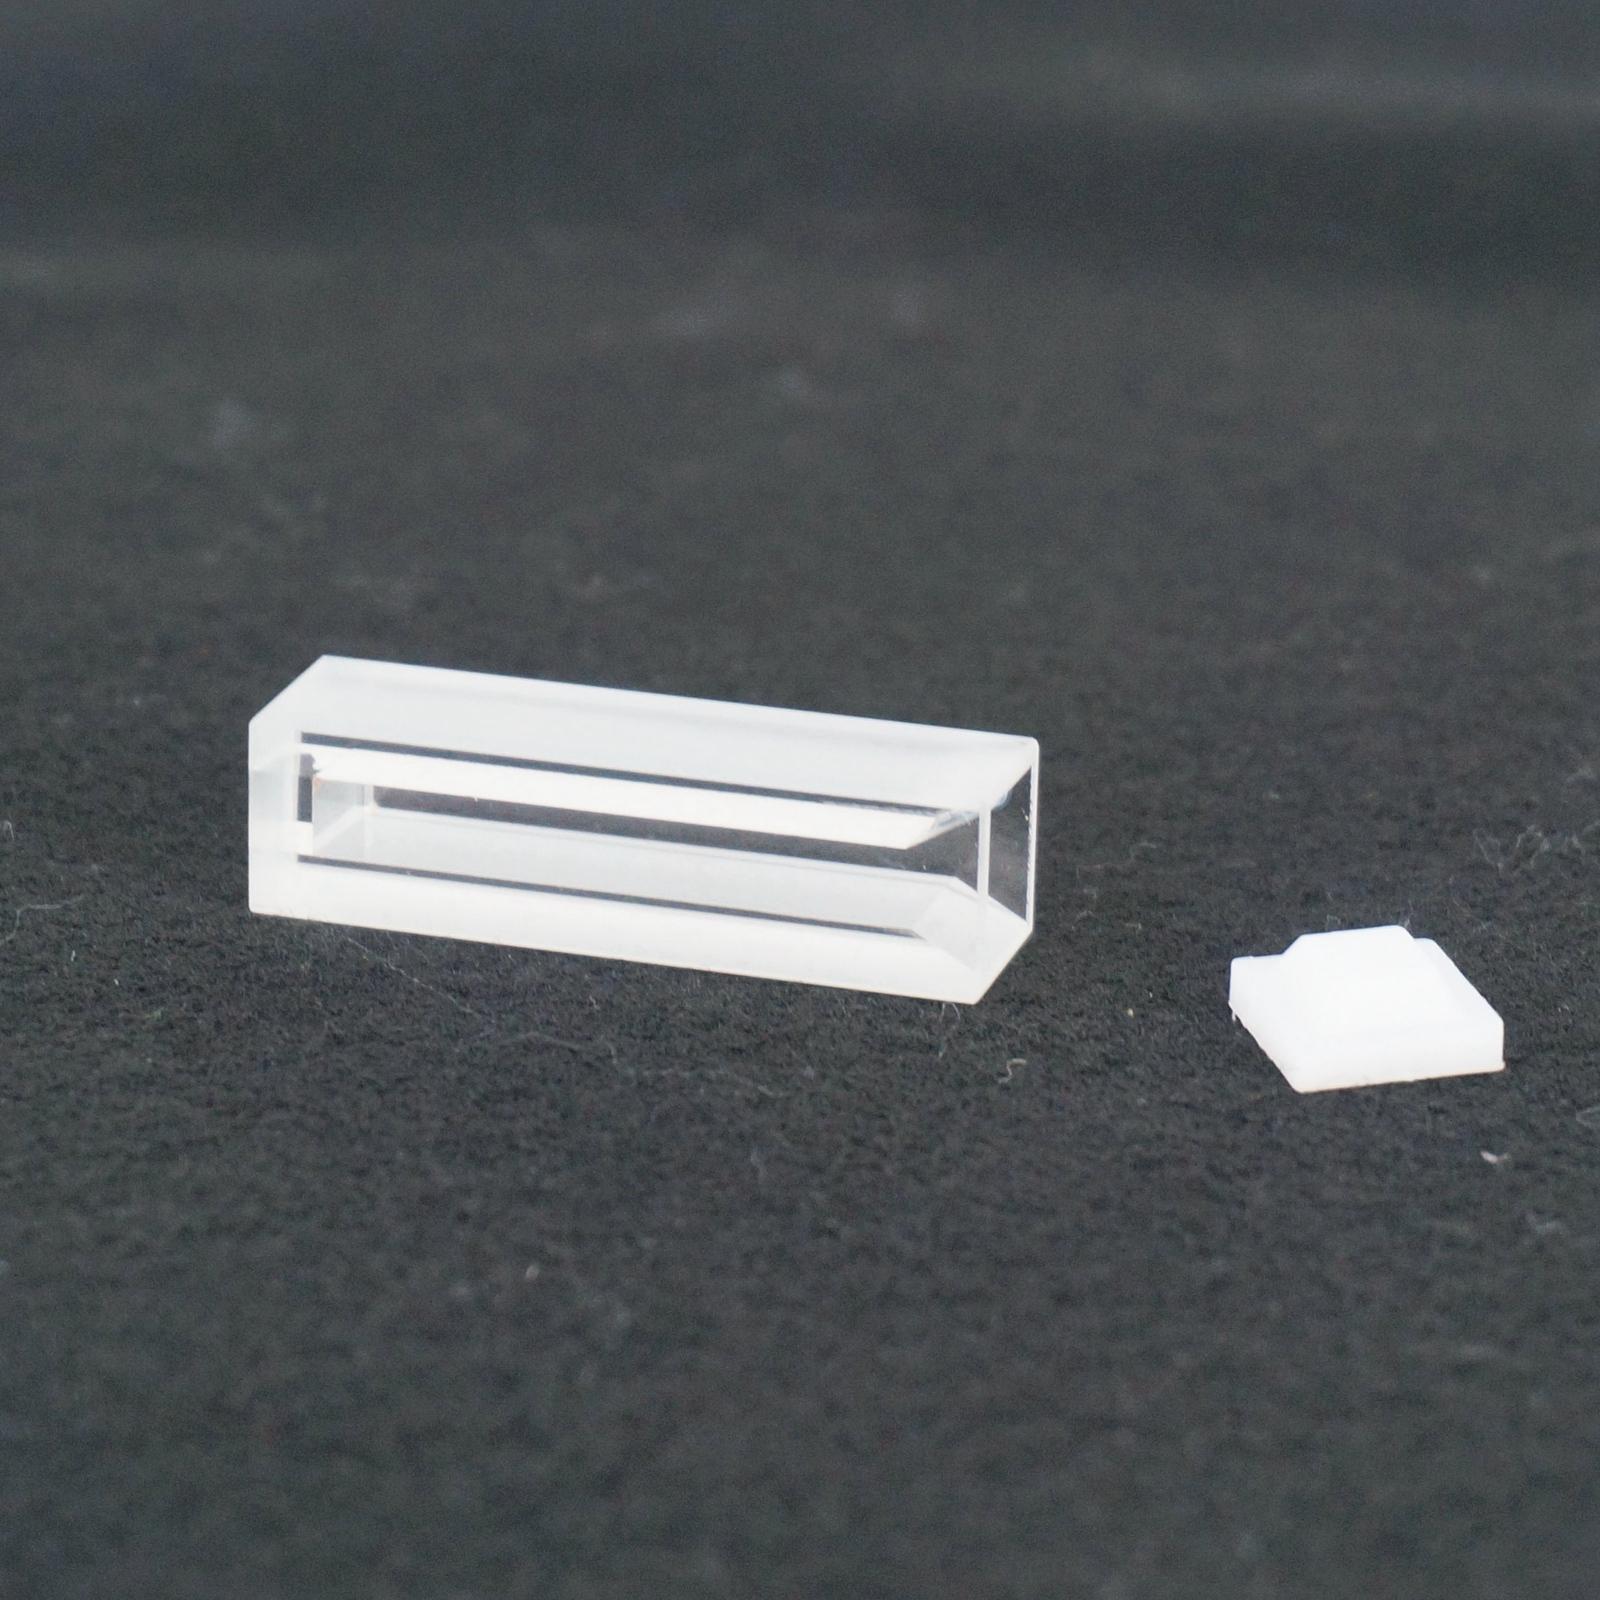 1400ul 10mm Path Length Micro JGS1 Quartz Cuvette With Telfon Lid